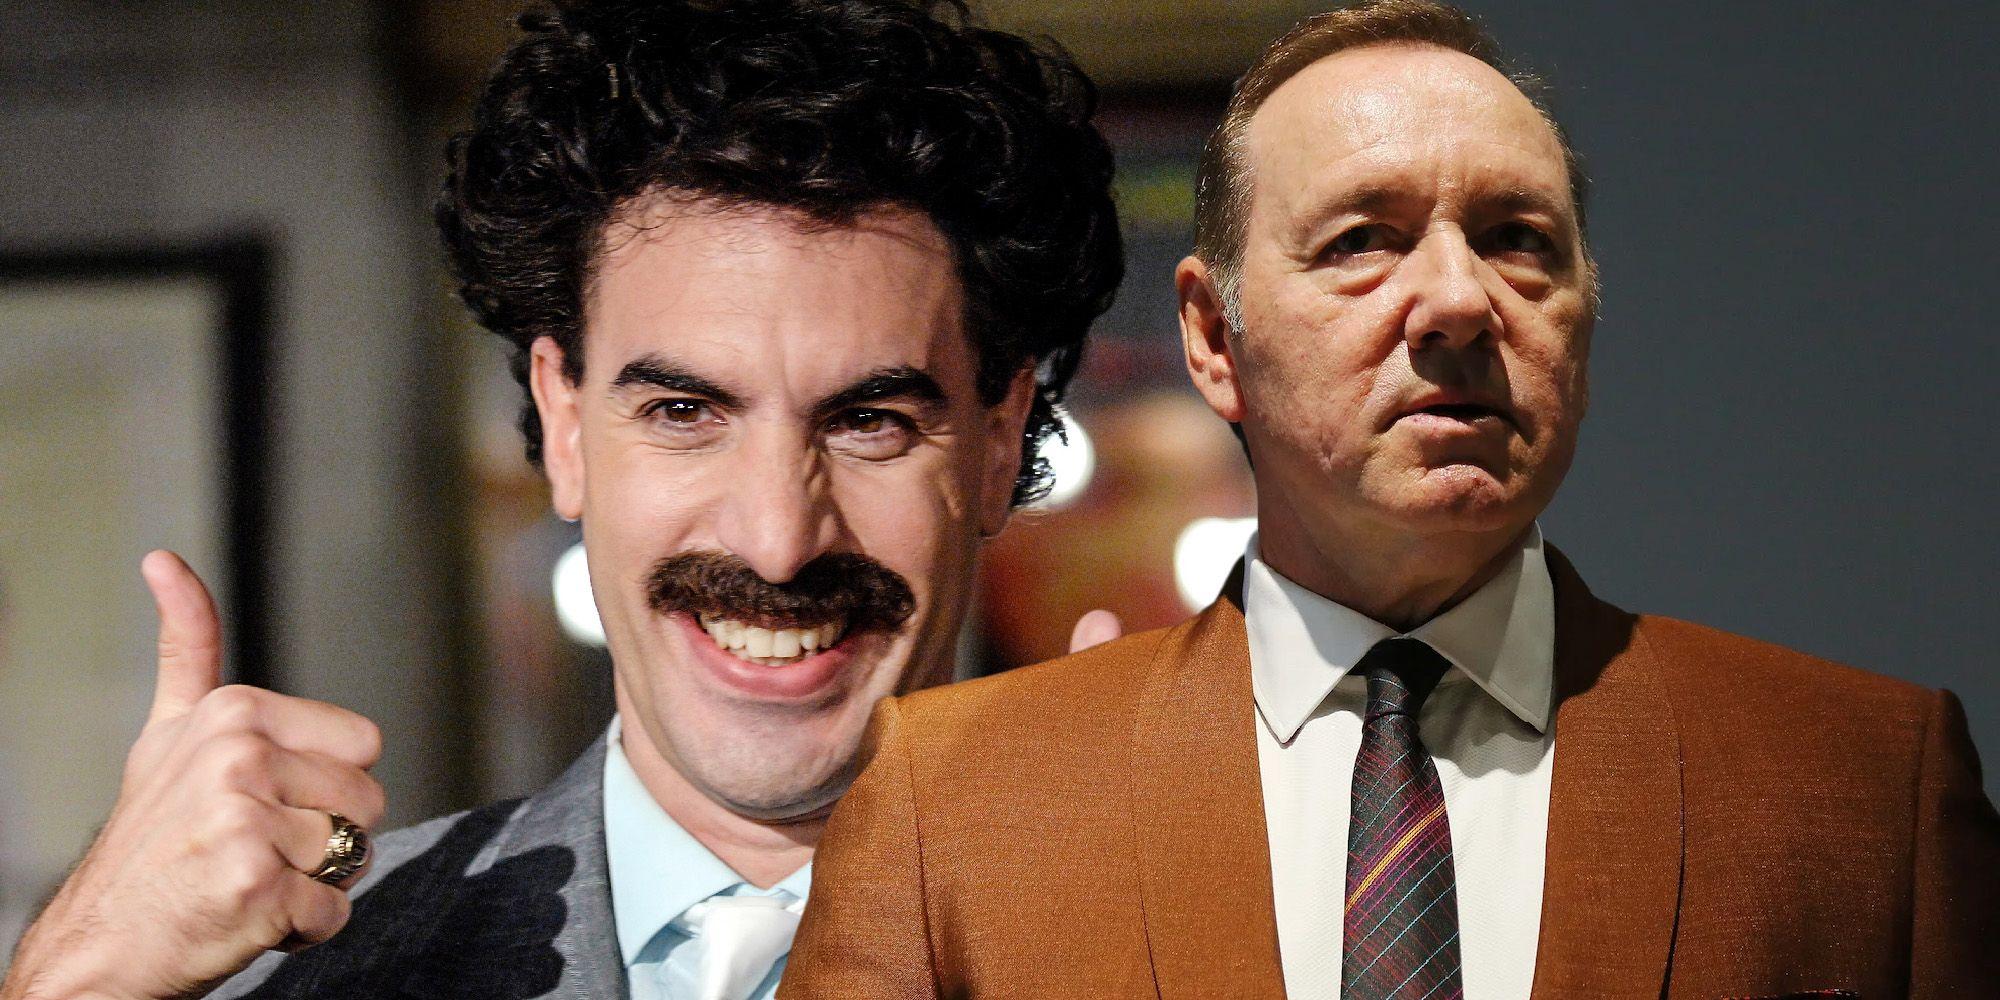 Borat 2: todas as celebridades mencionadas e zombadas 4